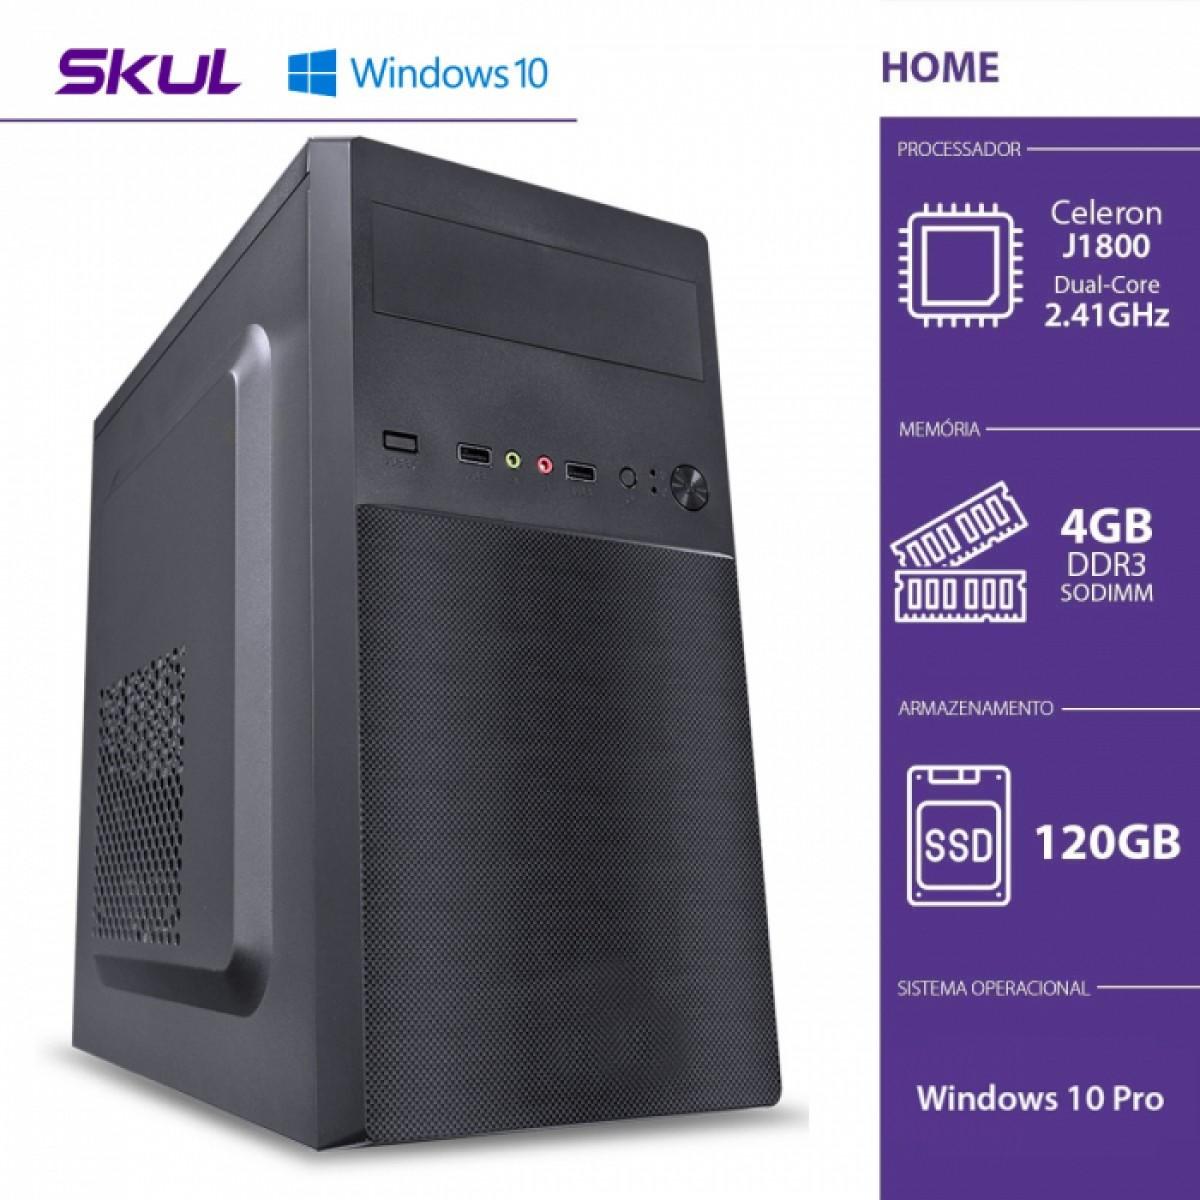 Computador Skul T-Home H100 CELERON DUAL CORE J1800 / 4GB DDR3 SODIMM / SSD 120GB / HDMI/VGA / FONTE 200W / Windows 10 Pro